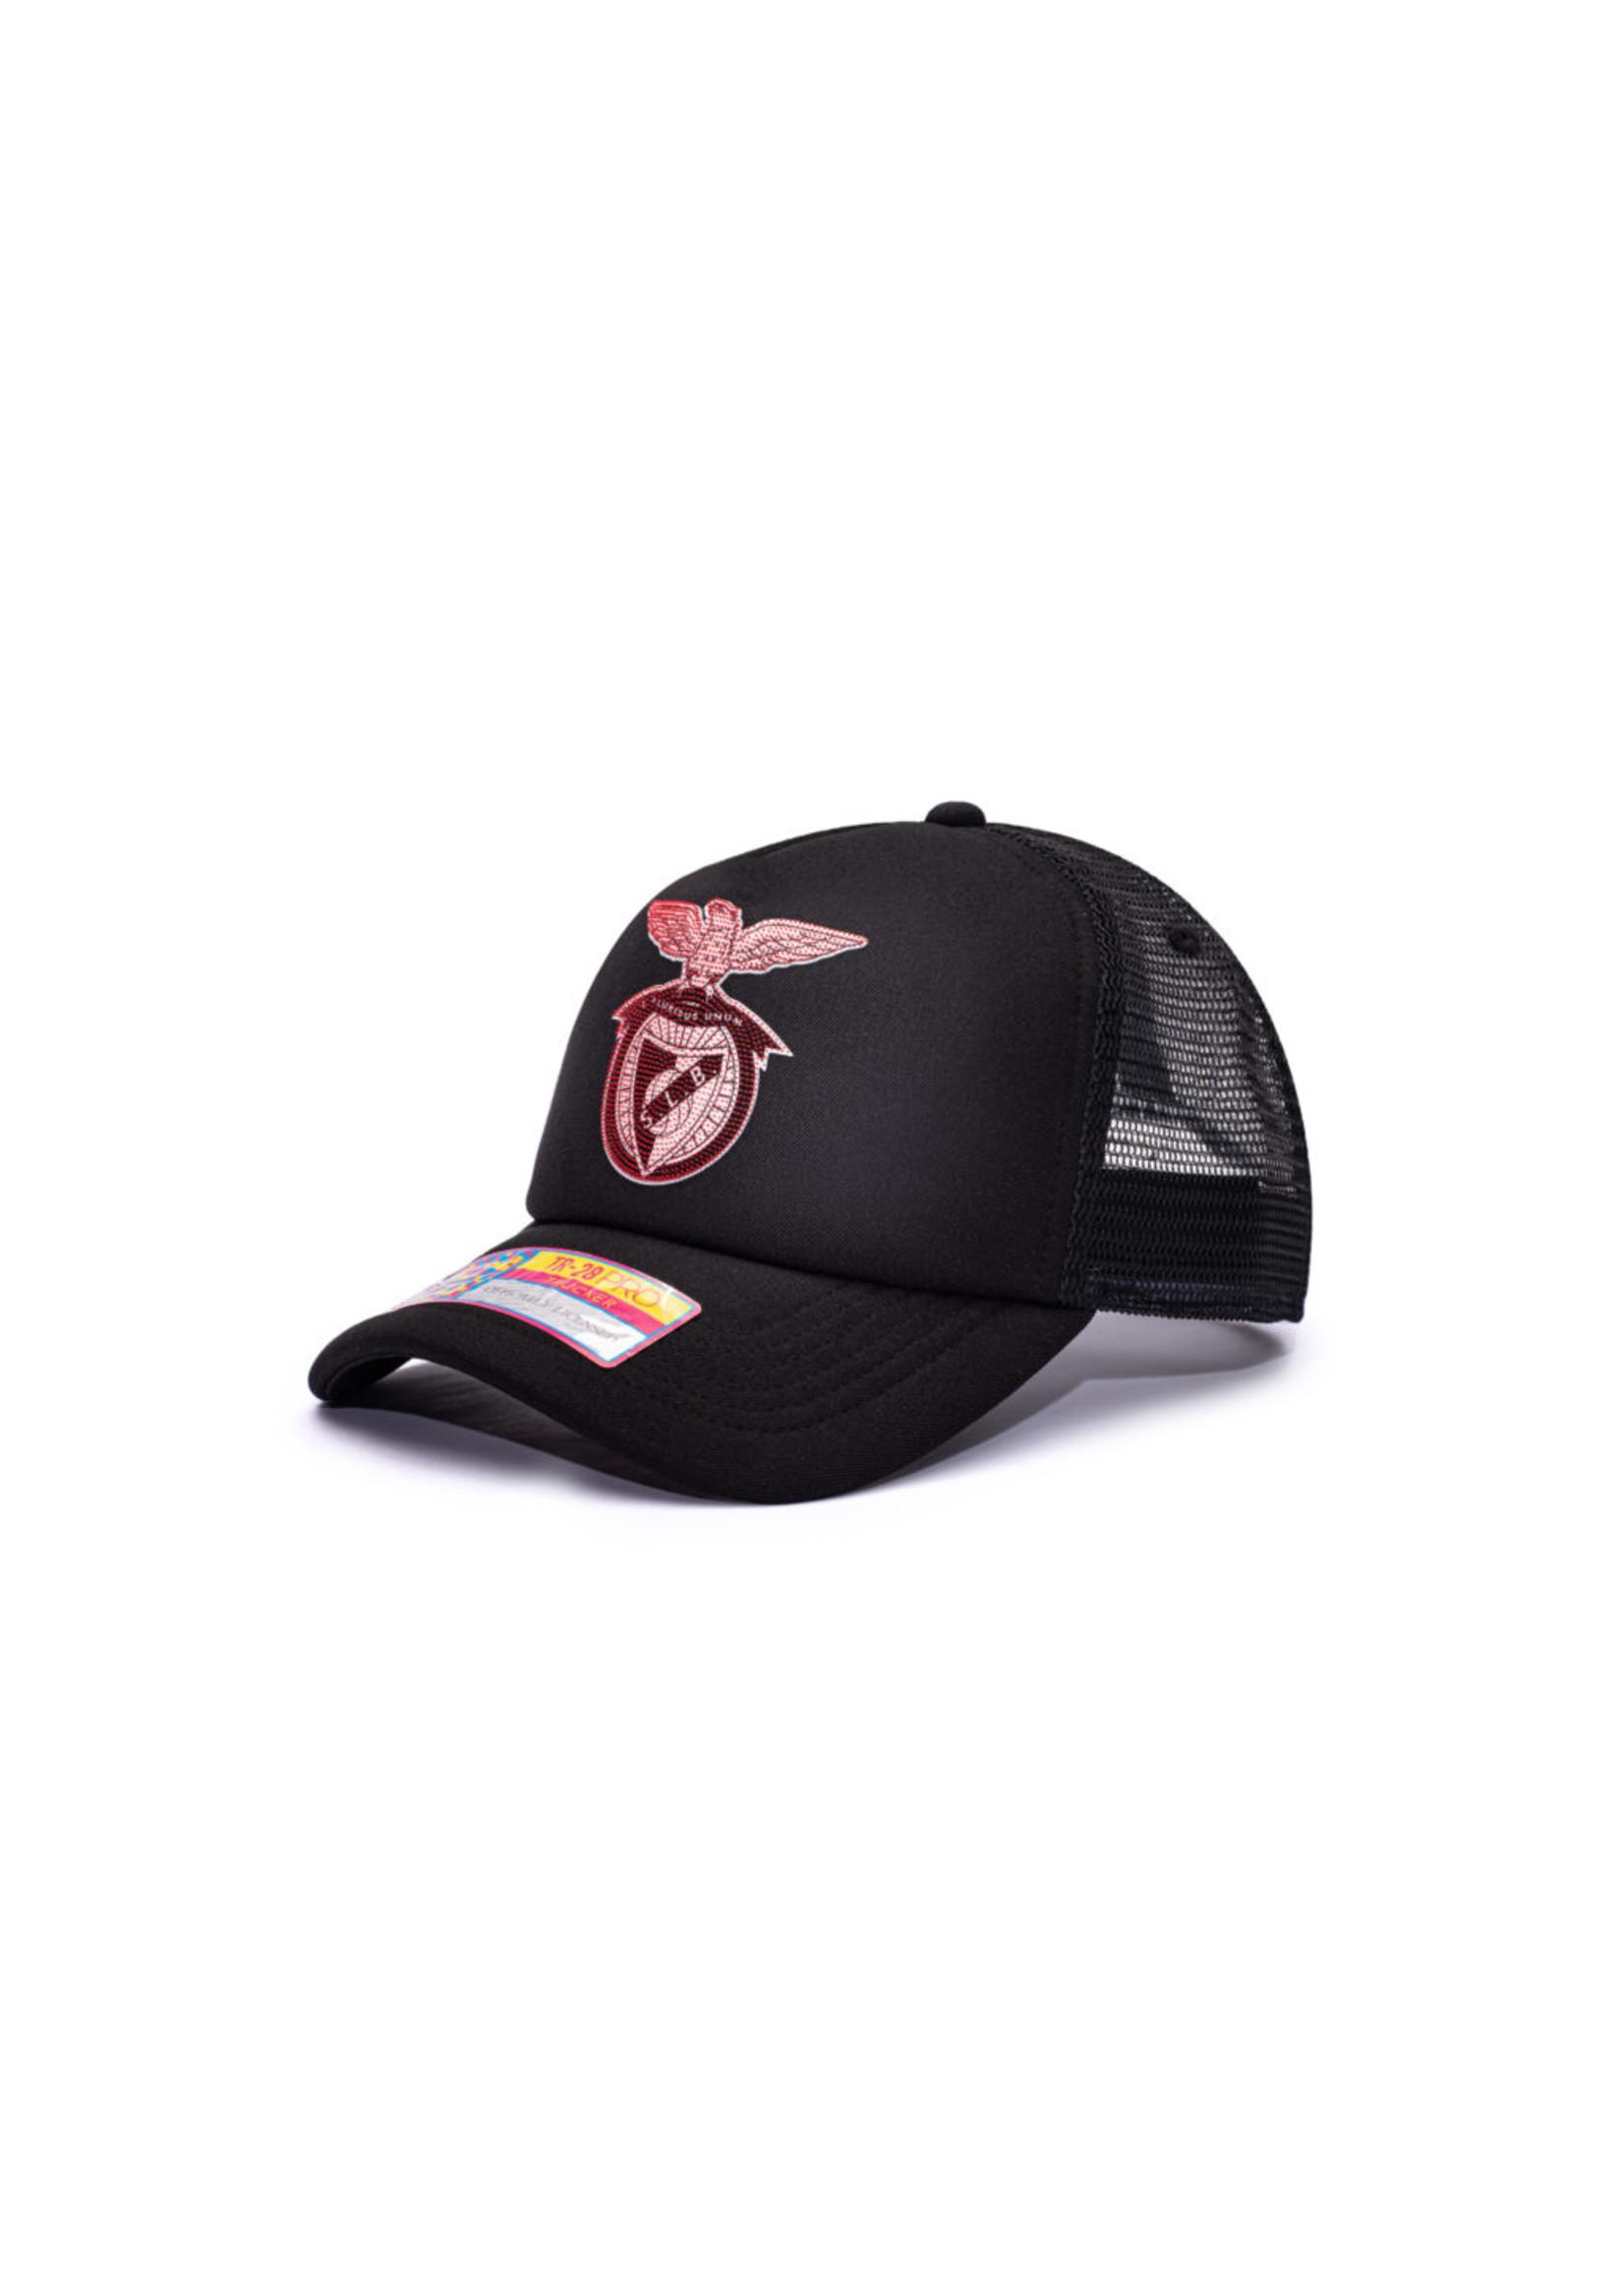 Benfica Shield Trucker Hat